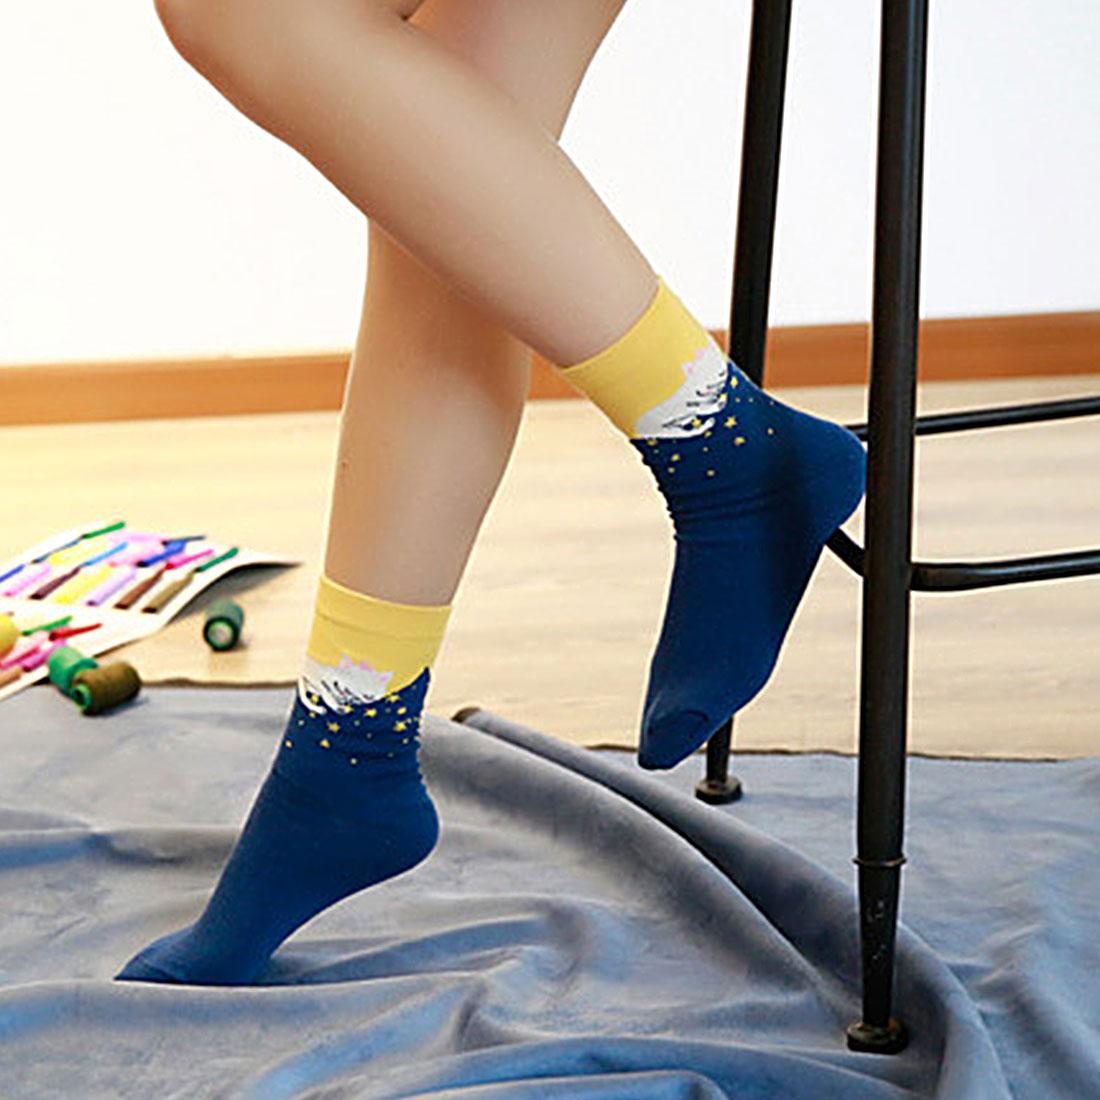 Hot 5 pairs/lot Multicolor Cute Cat Socks Harajuku Animal Design Women's Casual Comfortable Cotton Crew Socks Christmas